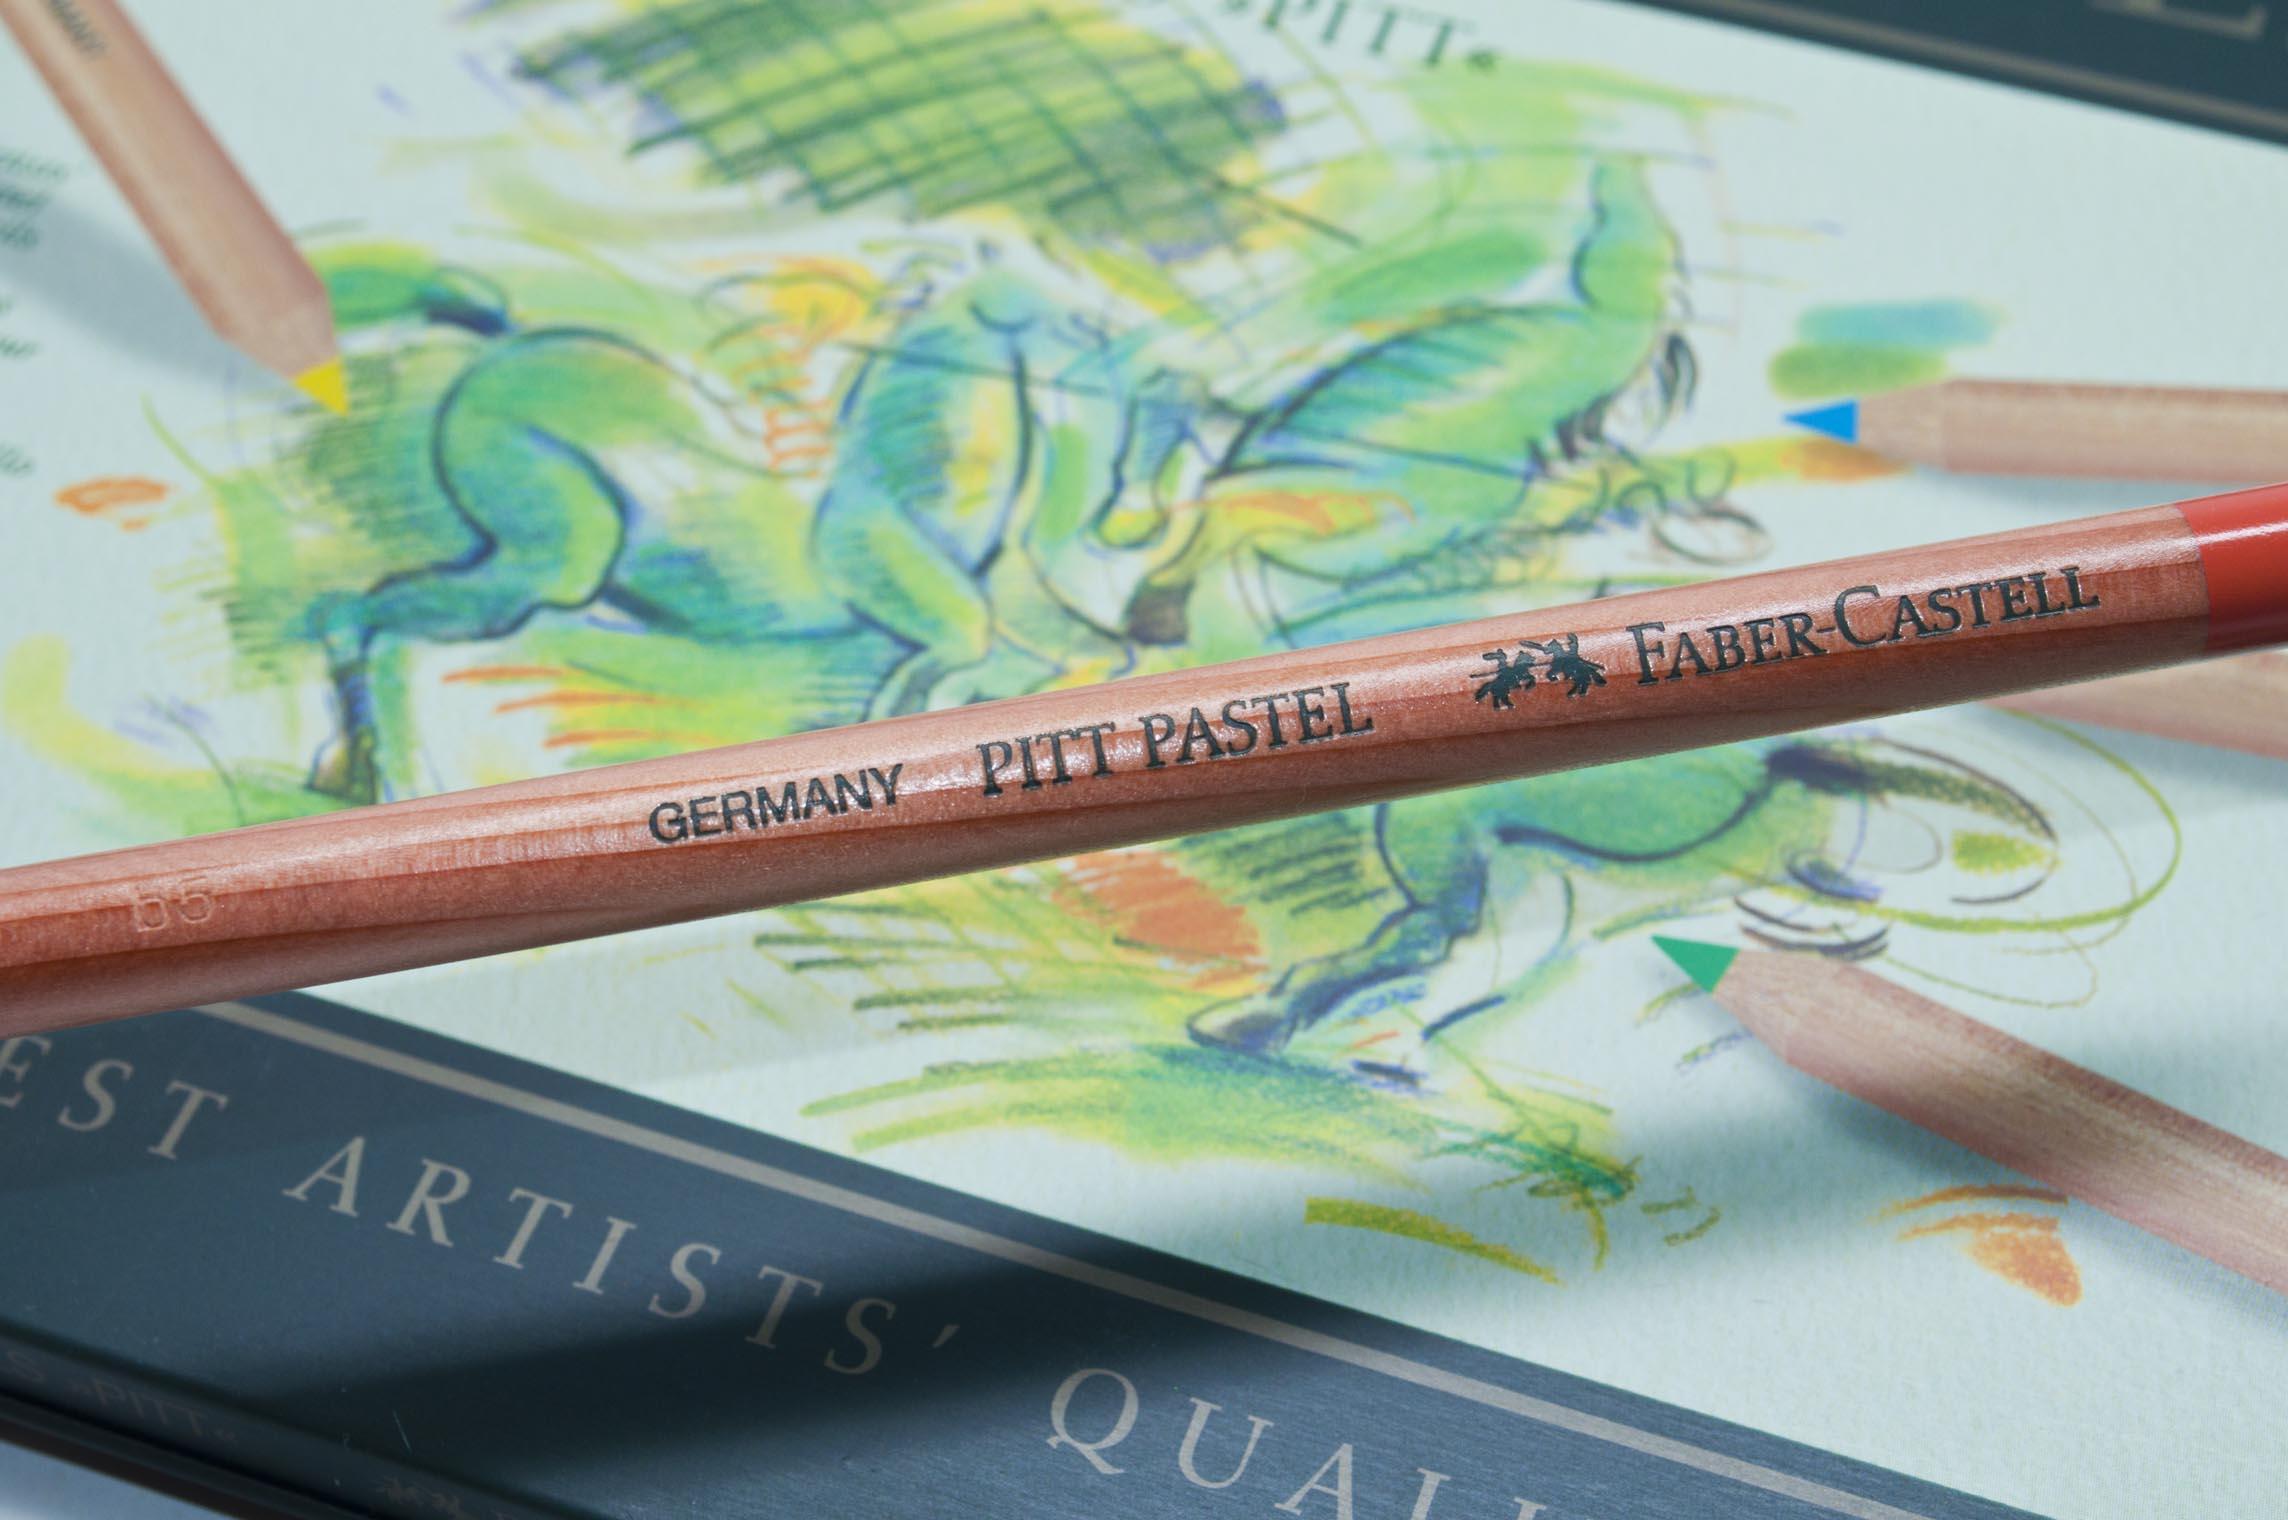 Pitt Pastel and Germany on the Barrel.jpg